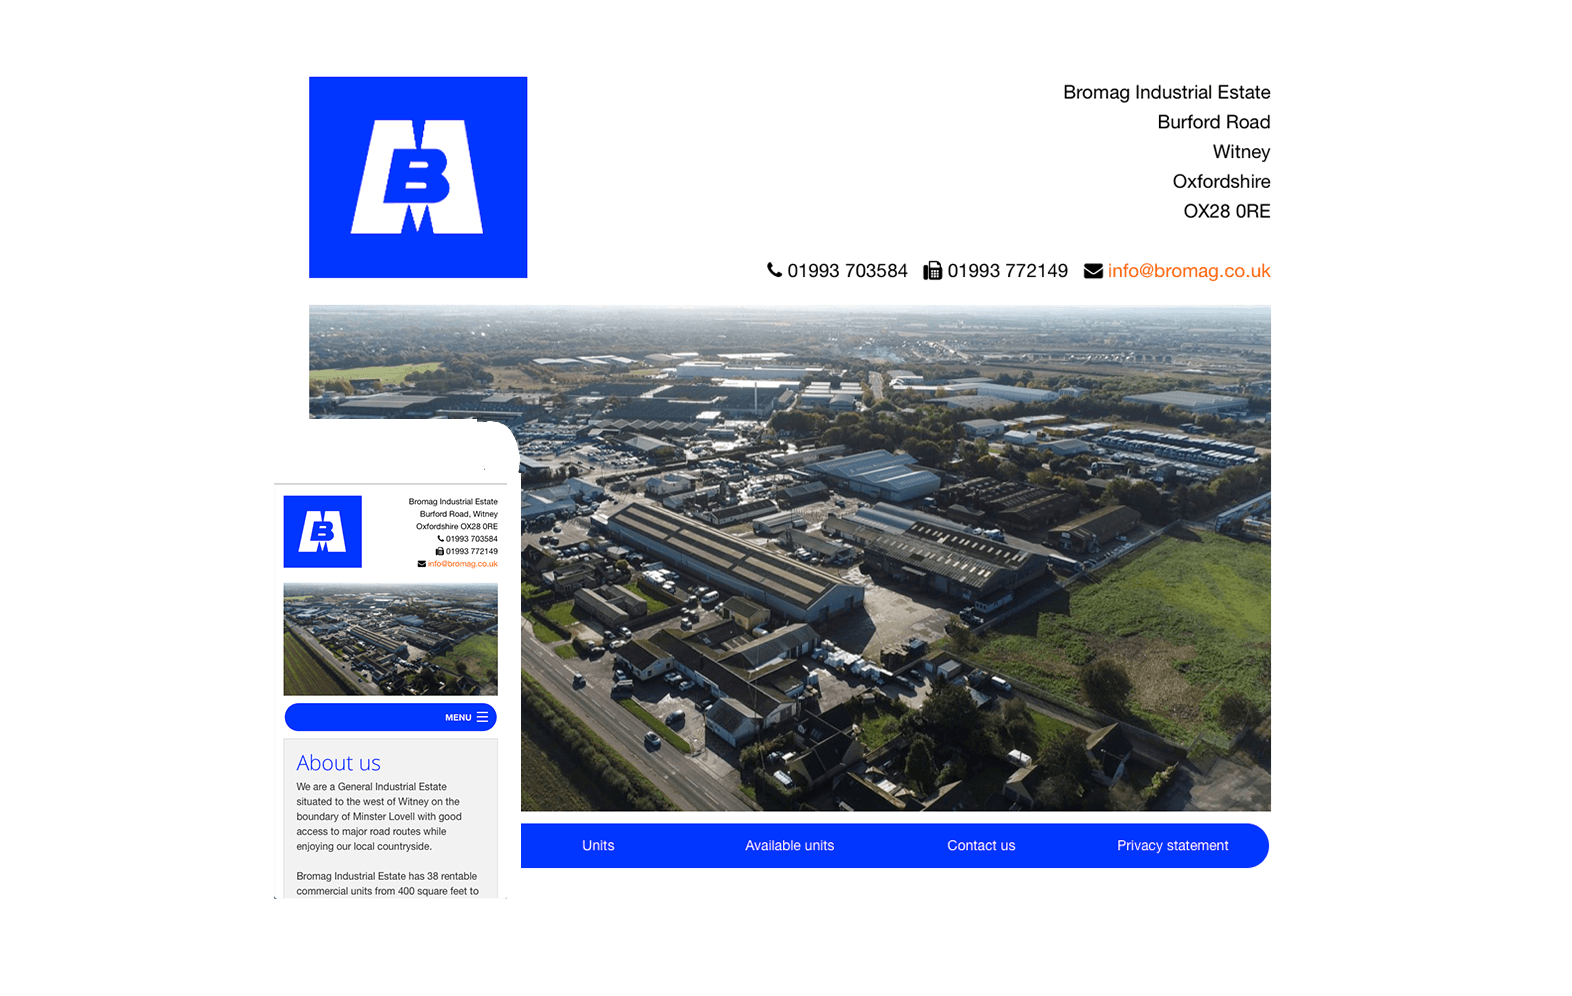 Bromag website image